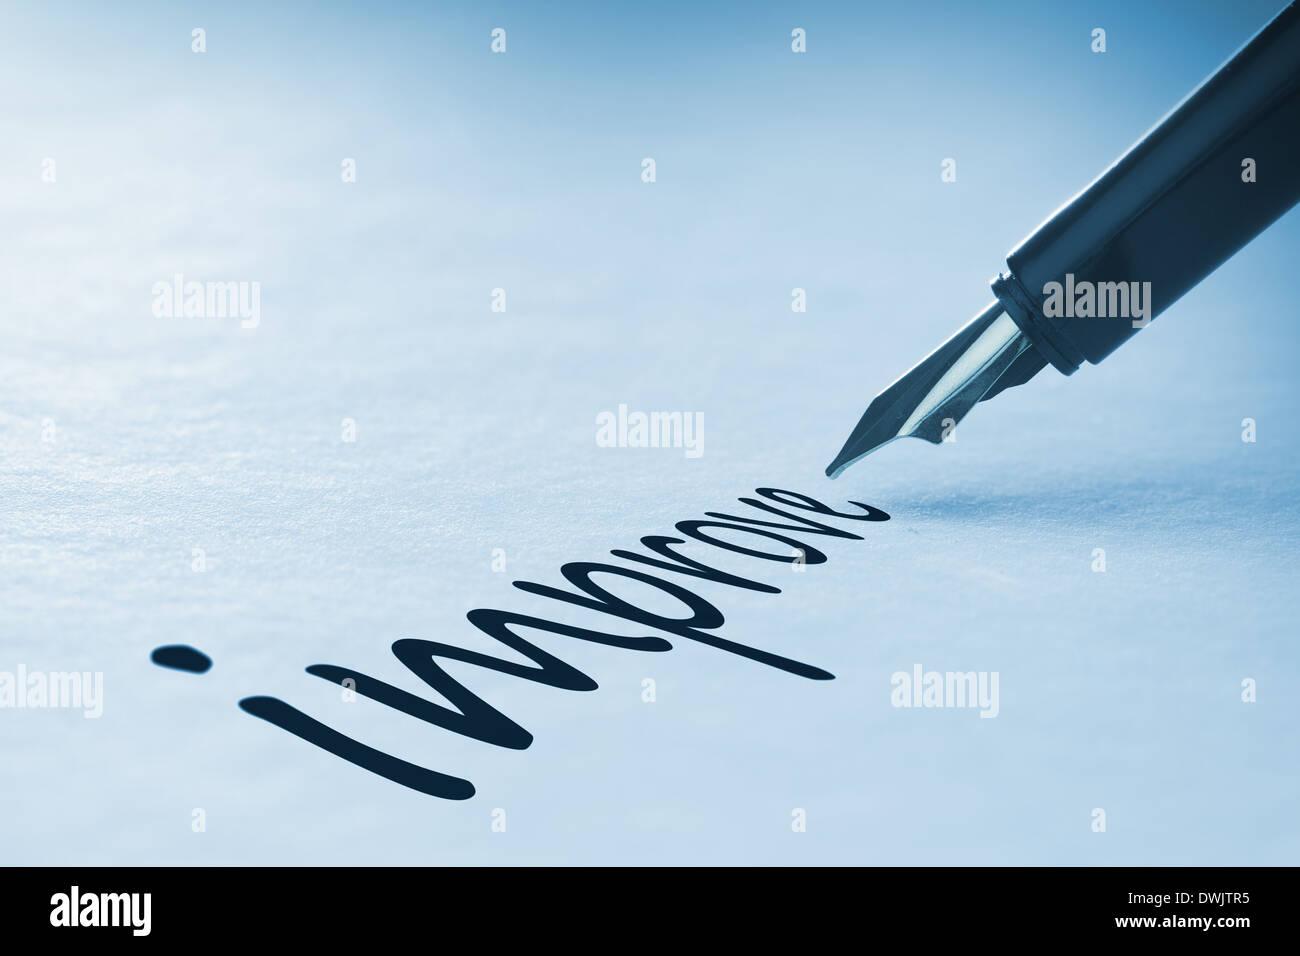 Fountain pen writing Improve - Stock Image